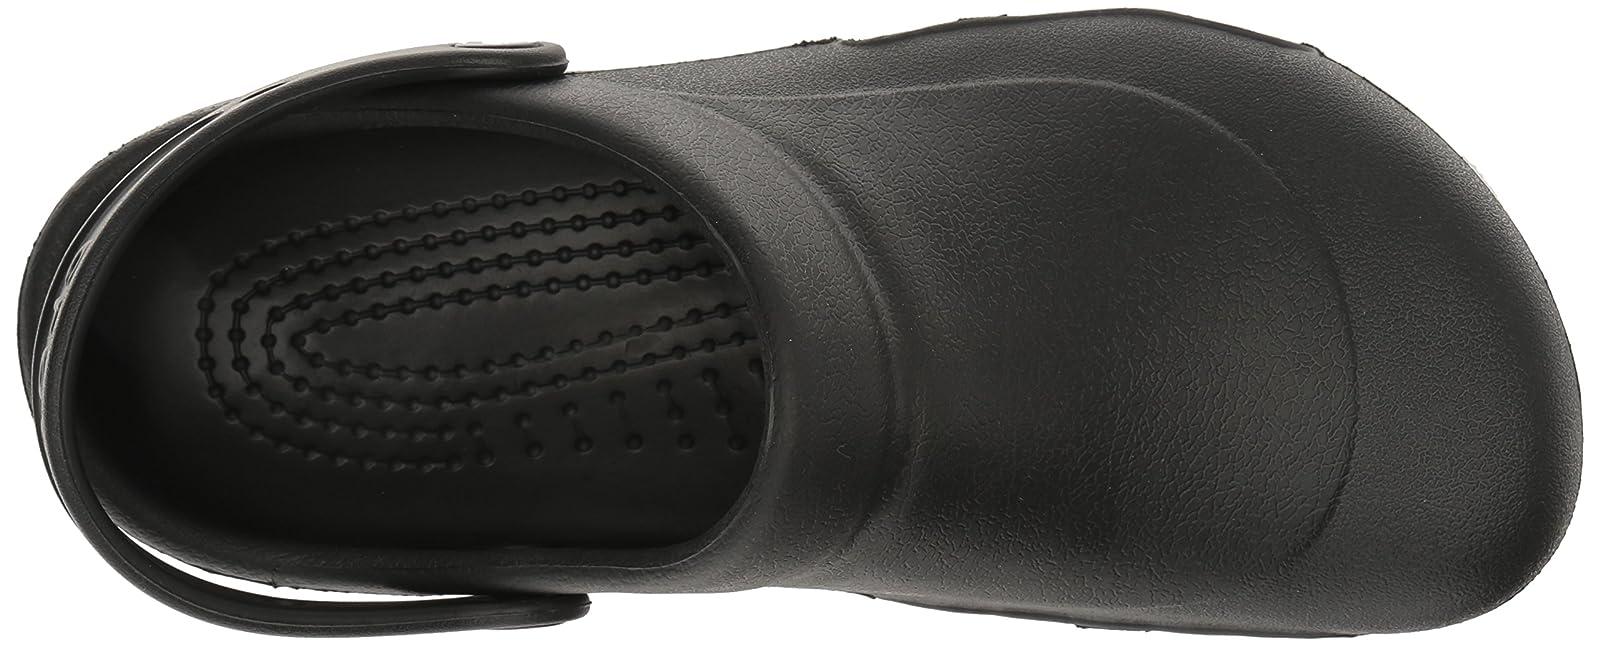 Crocs Unisex Specialist Vent Clog Black 11 10074M Black - 12